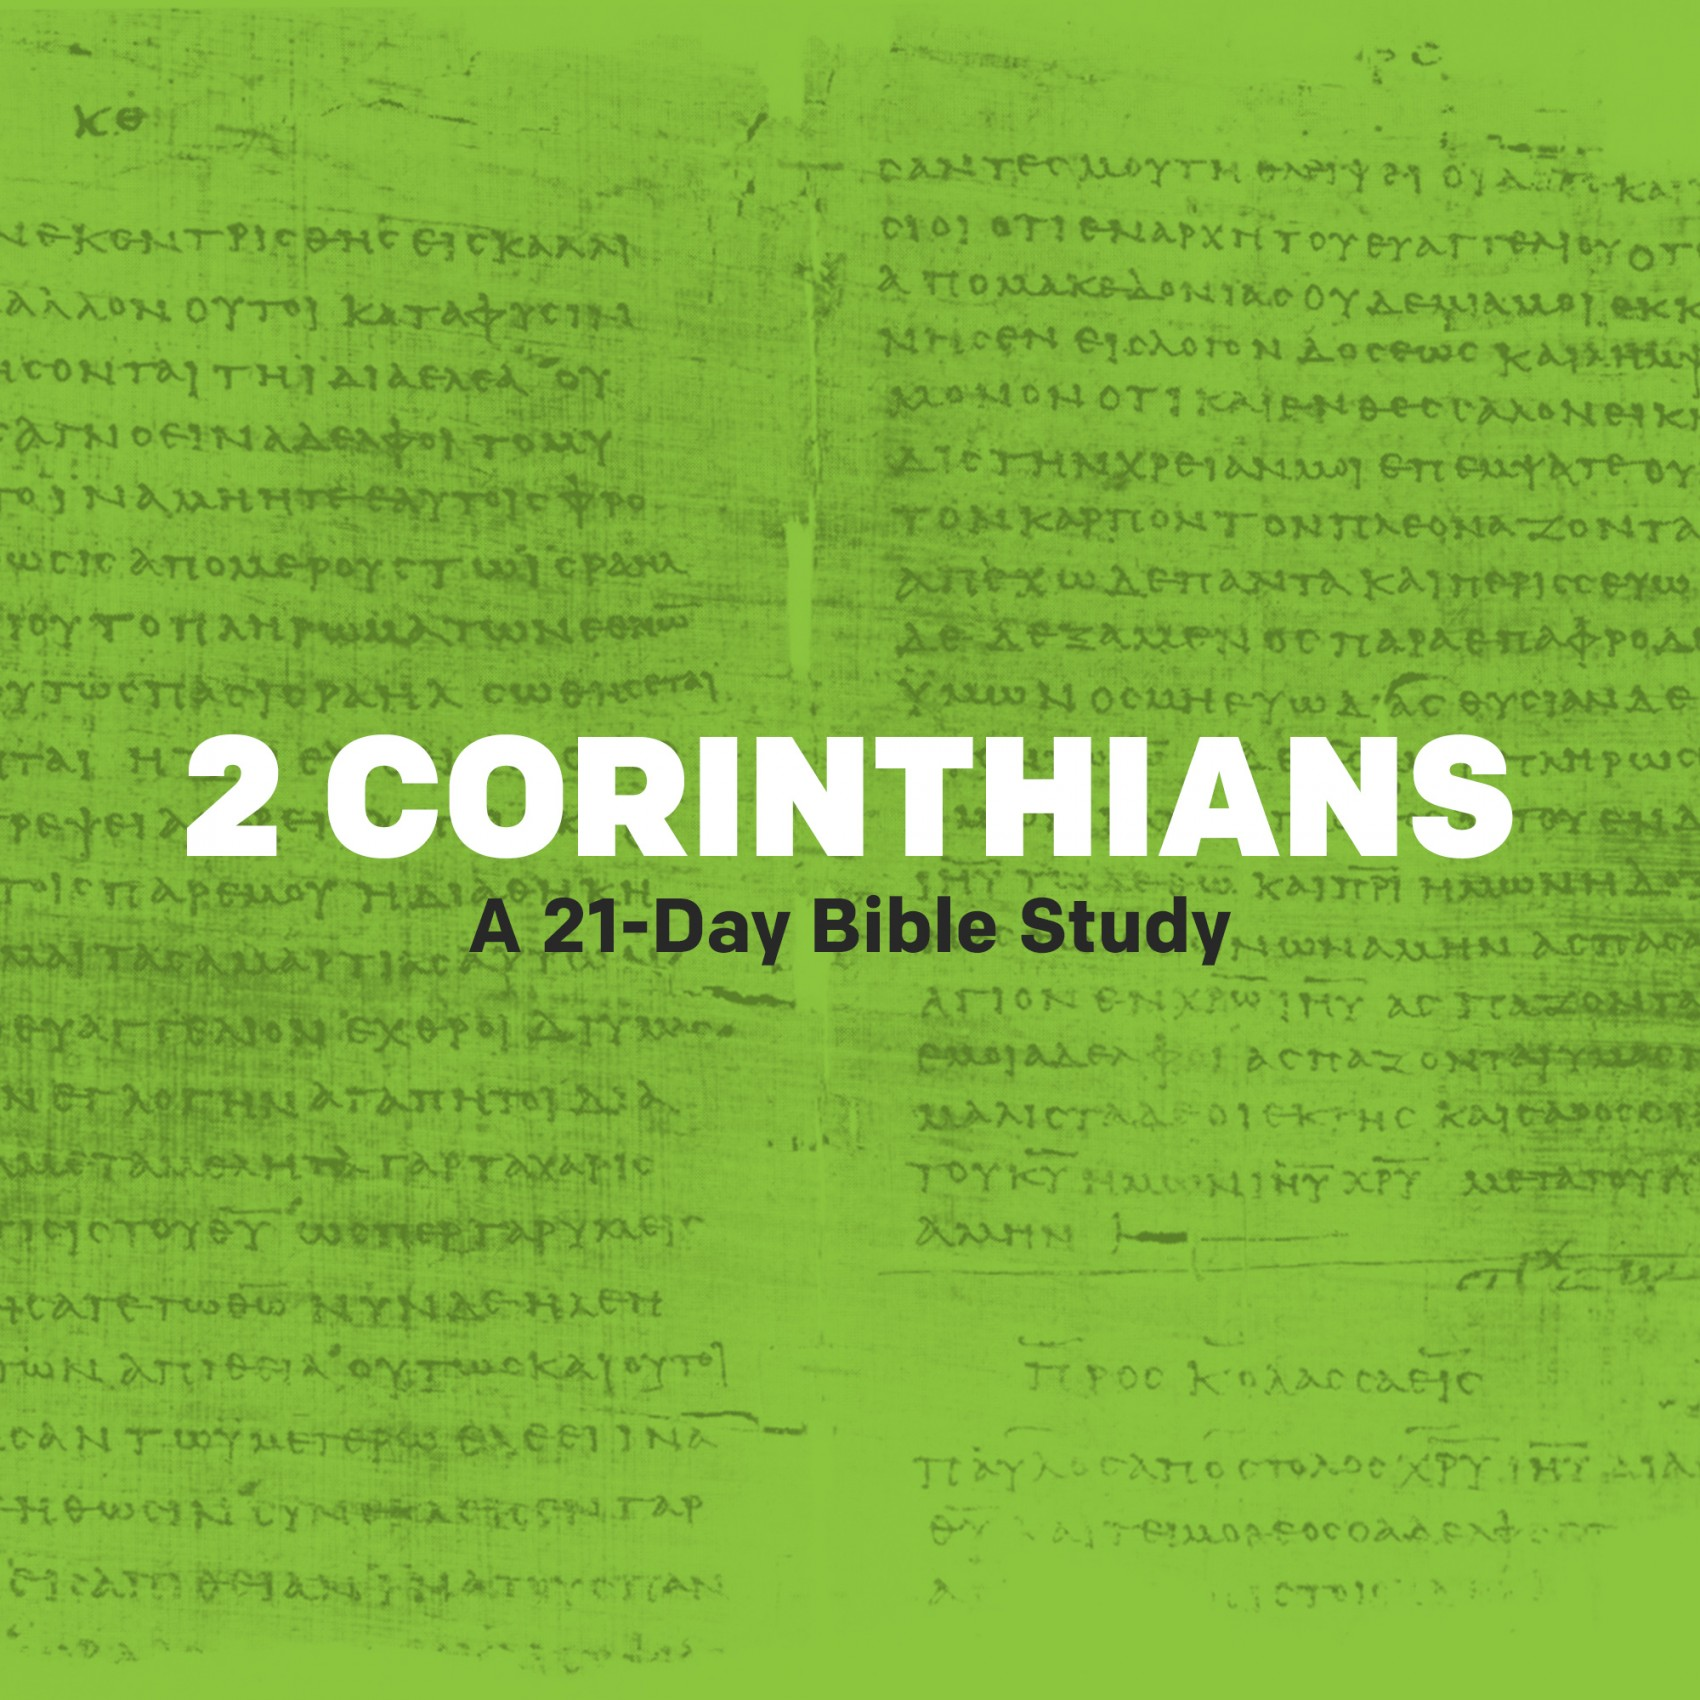 tug-of-war | 2 corinthians: 21-day bible study | newspring church